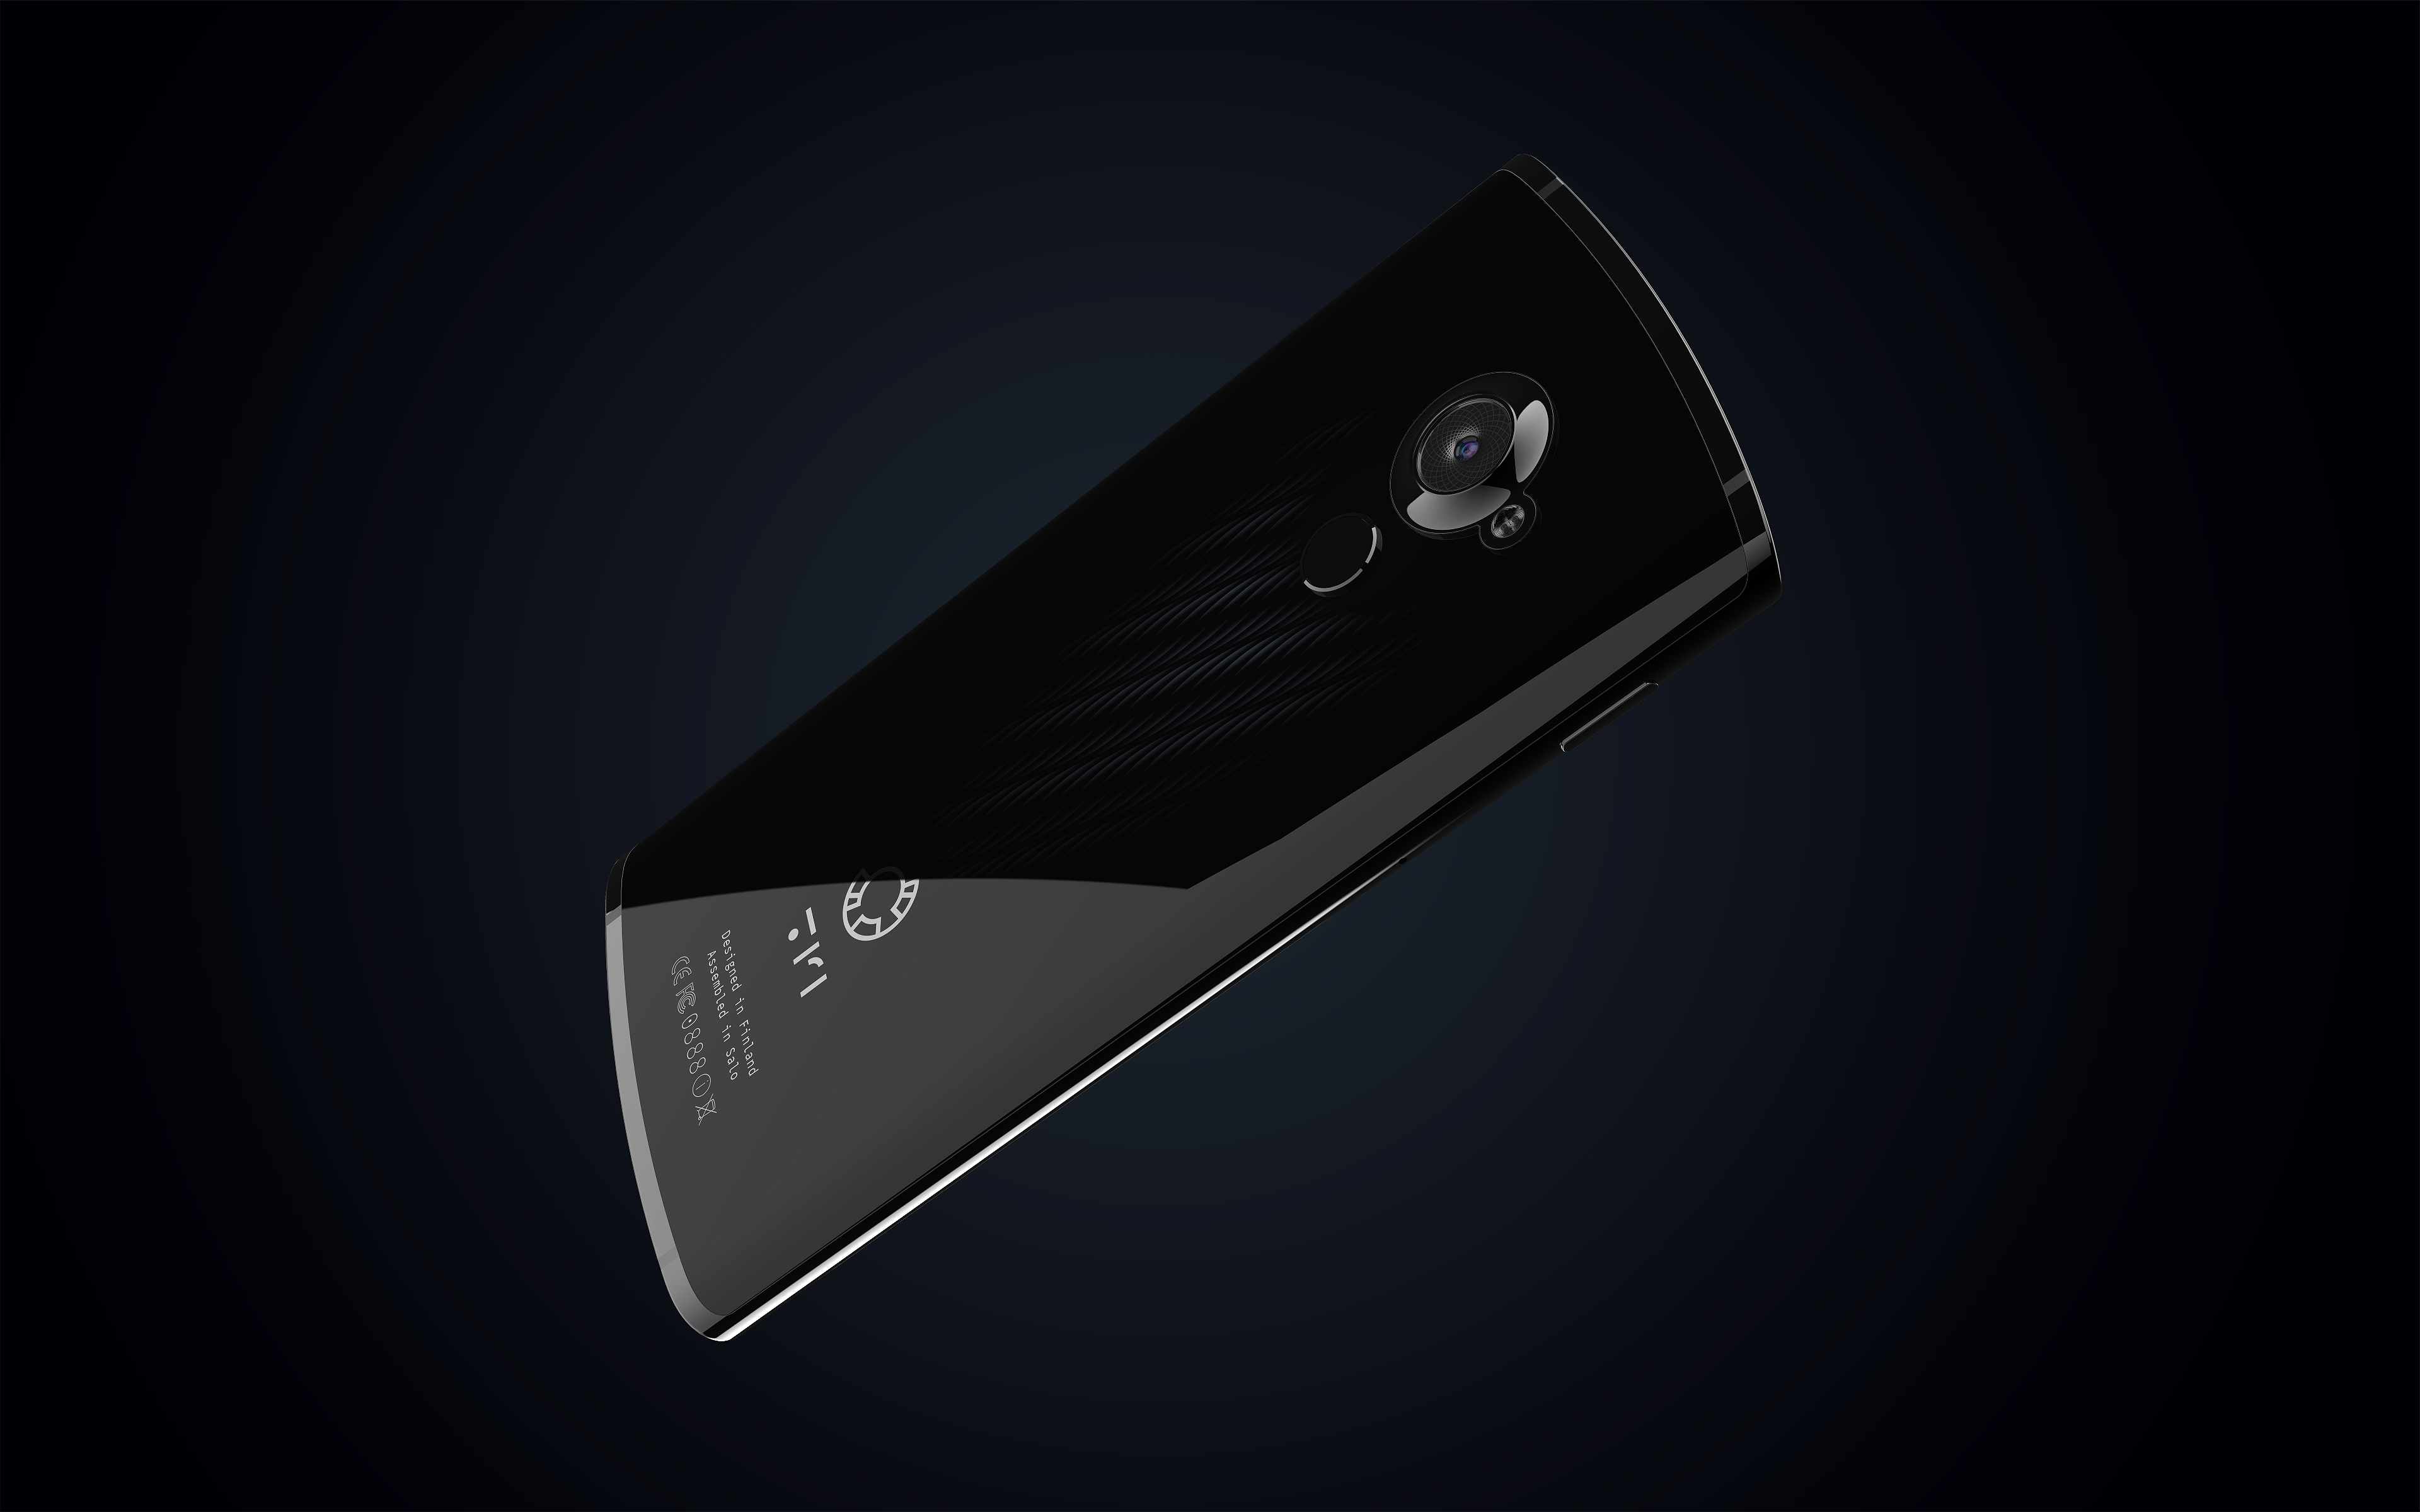 Turing Phone Appassionato